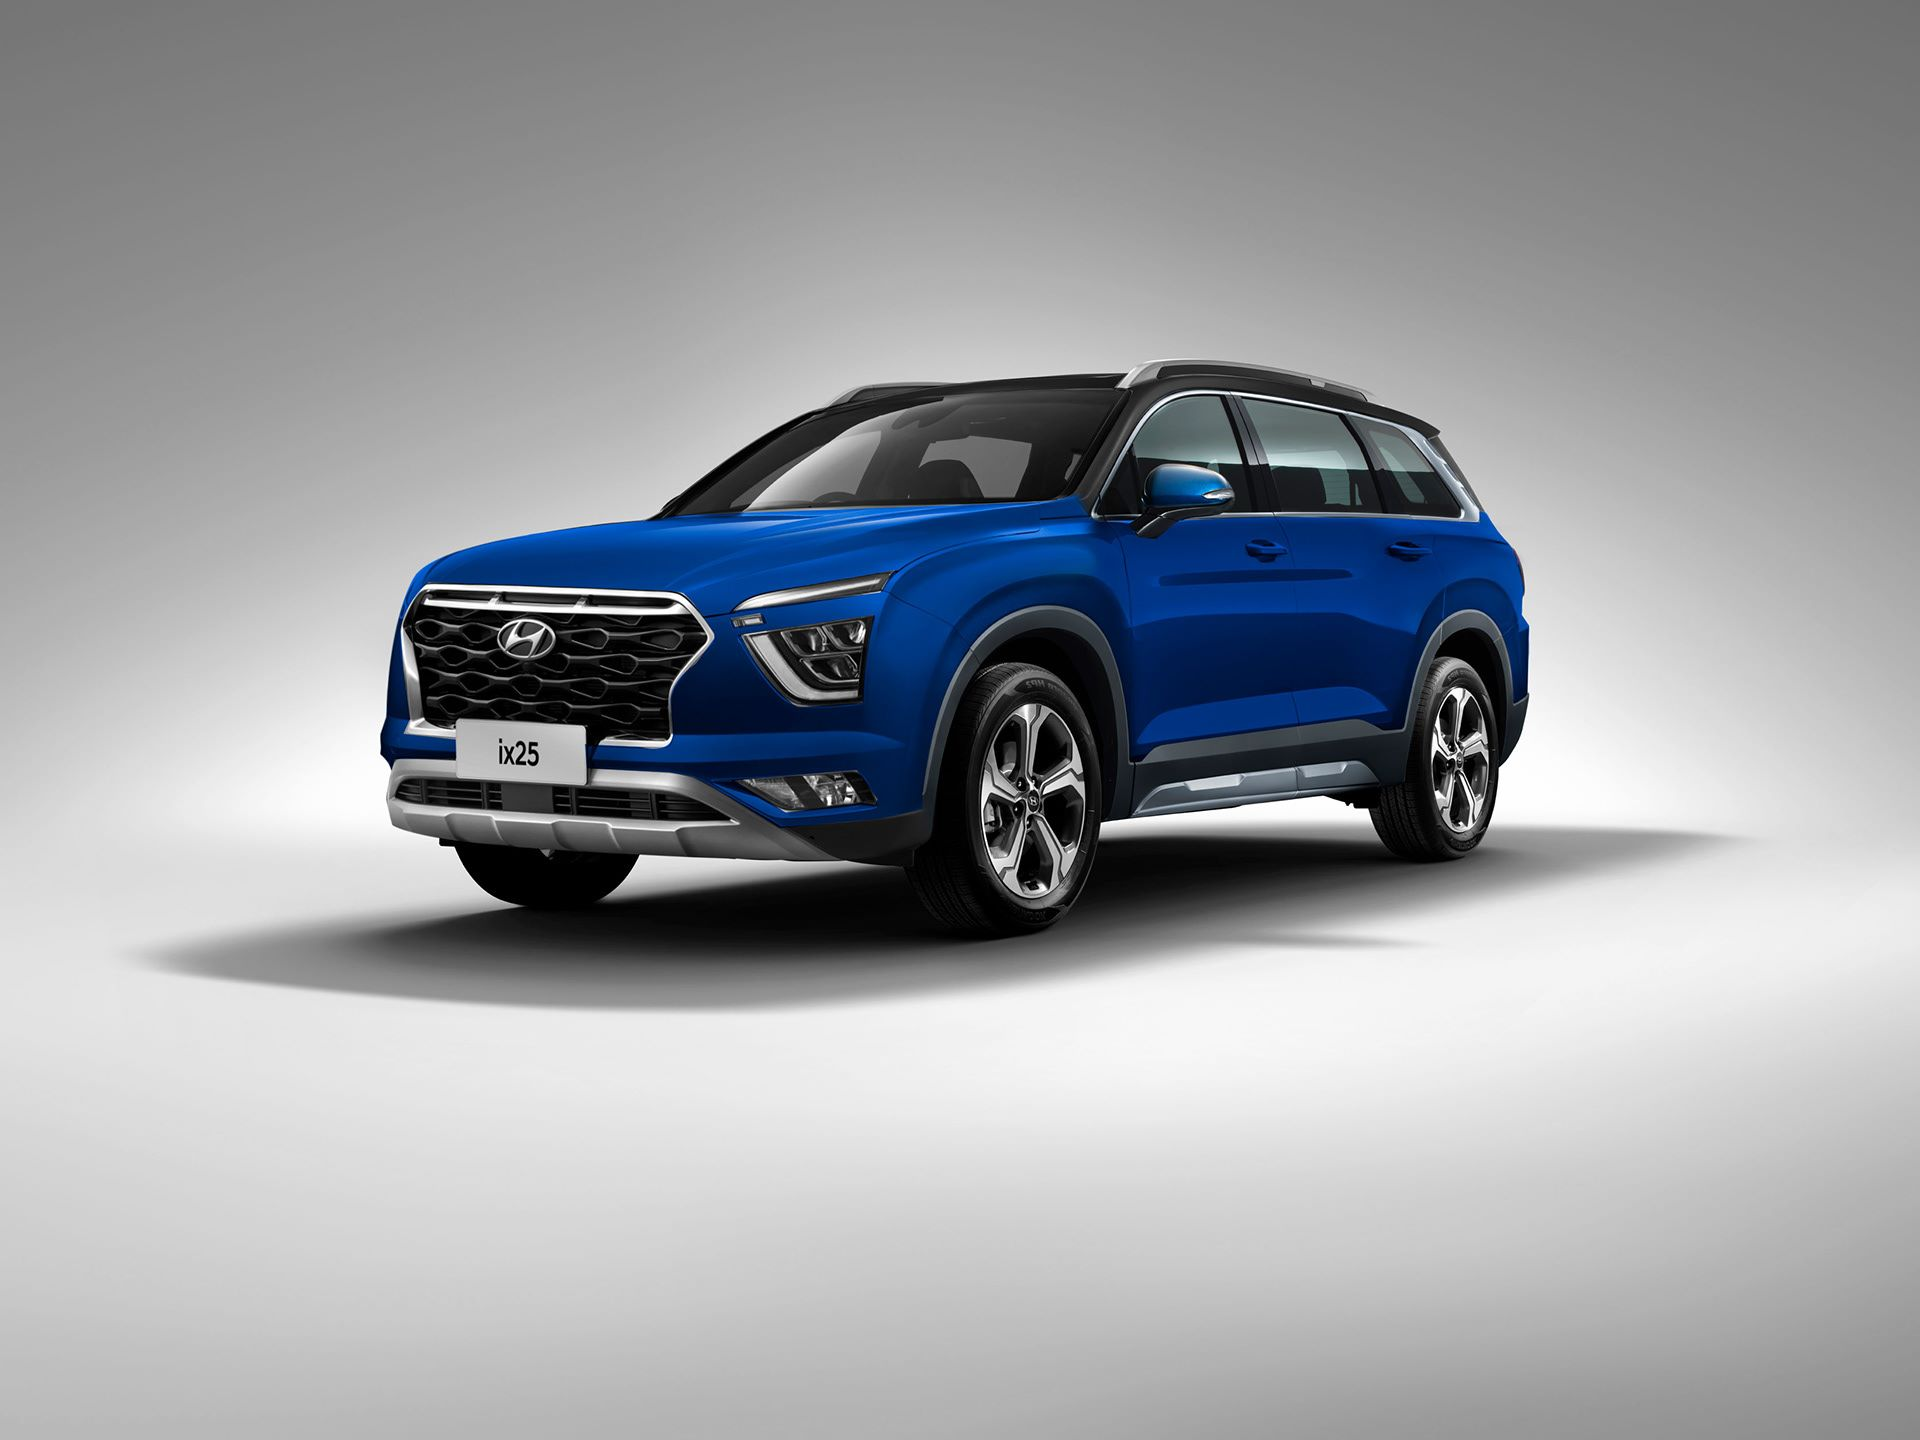 Hyundai-Grand-ix25-Creta